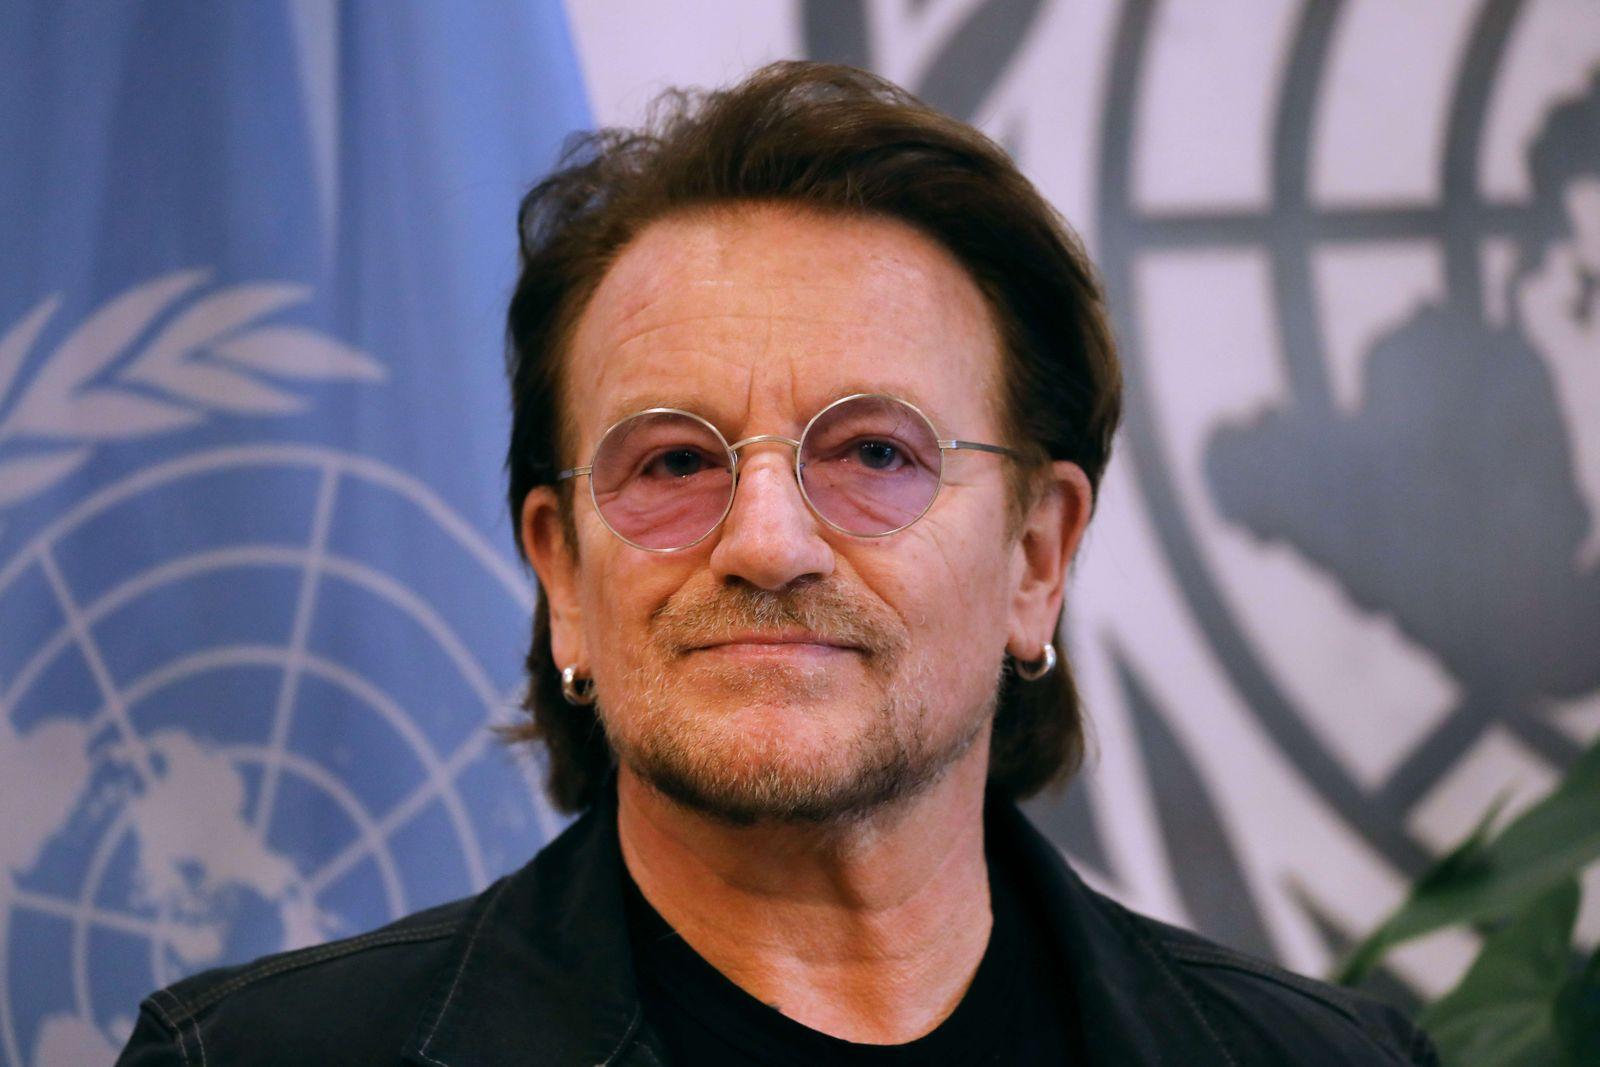 Bono Meets With United Nations Secretary General Antonio Guterres At The U.N.